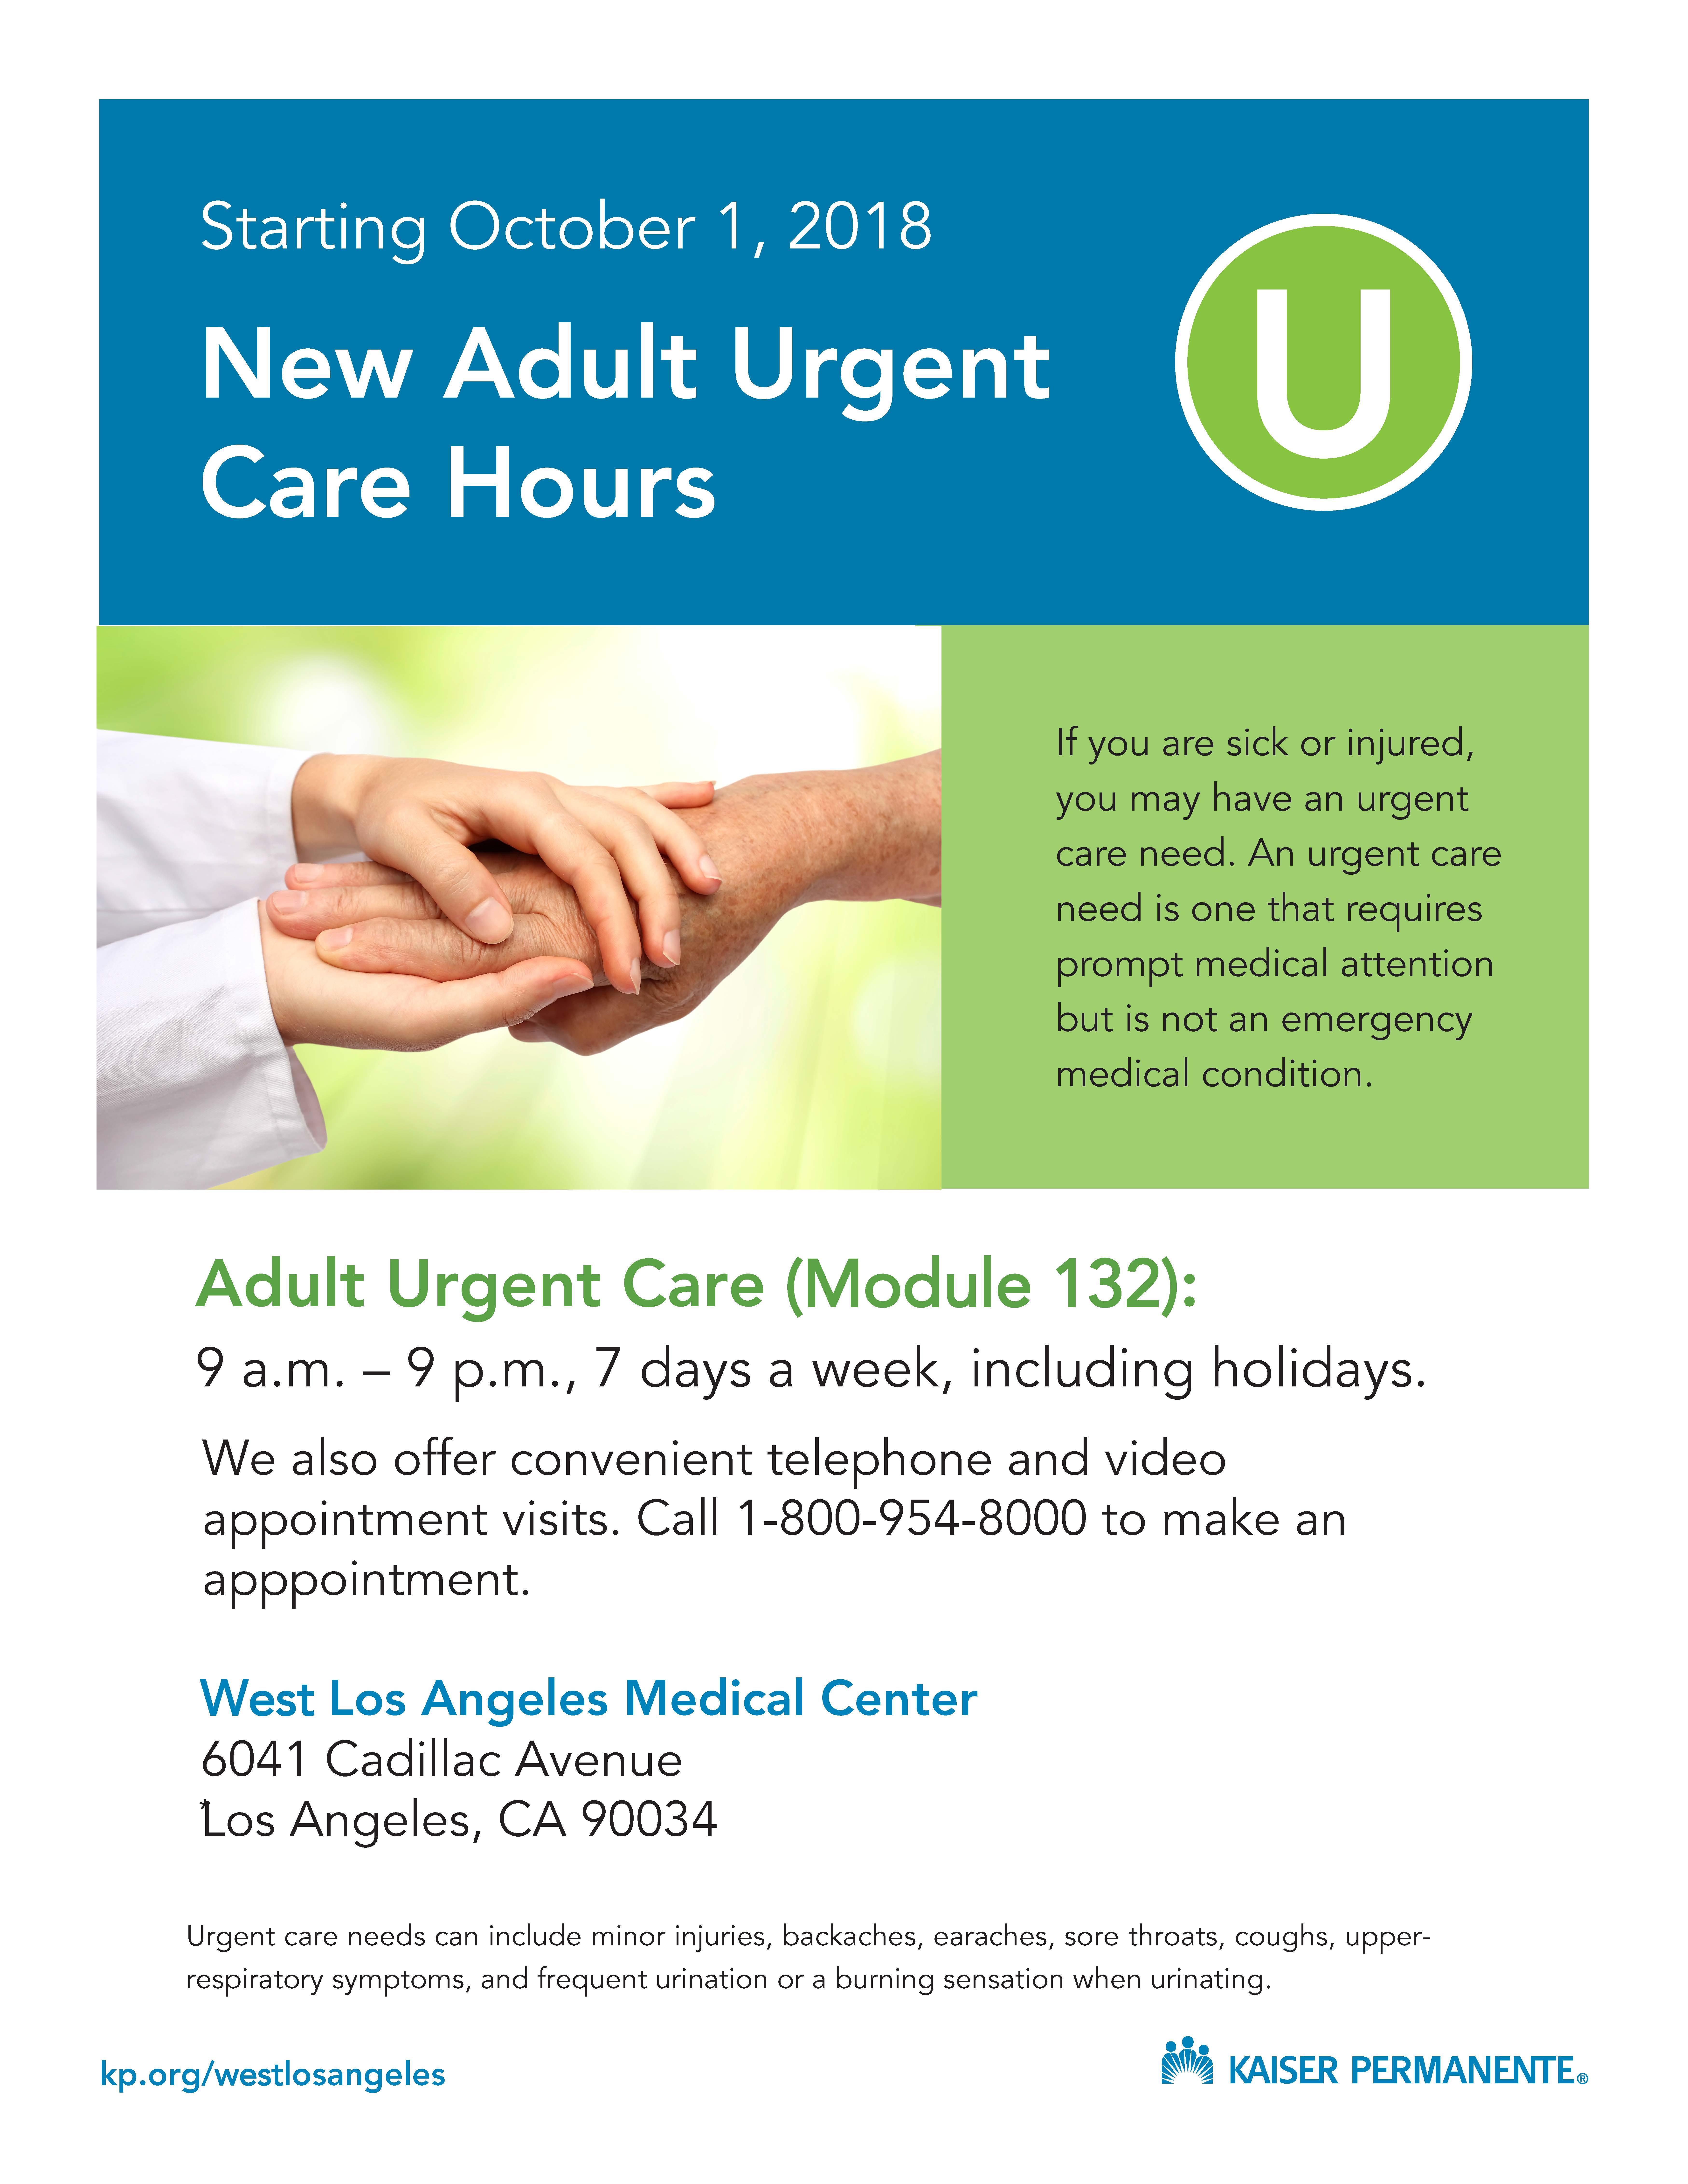 West LA Emergency and Urgent Care | Kaiser Permanente